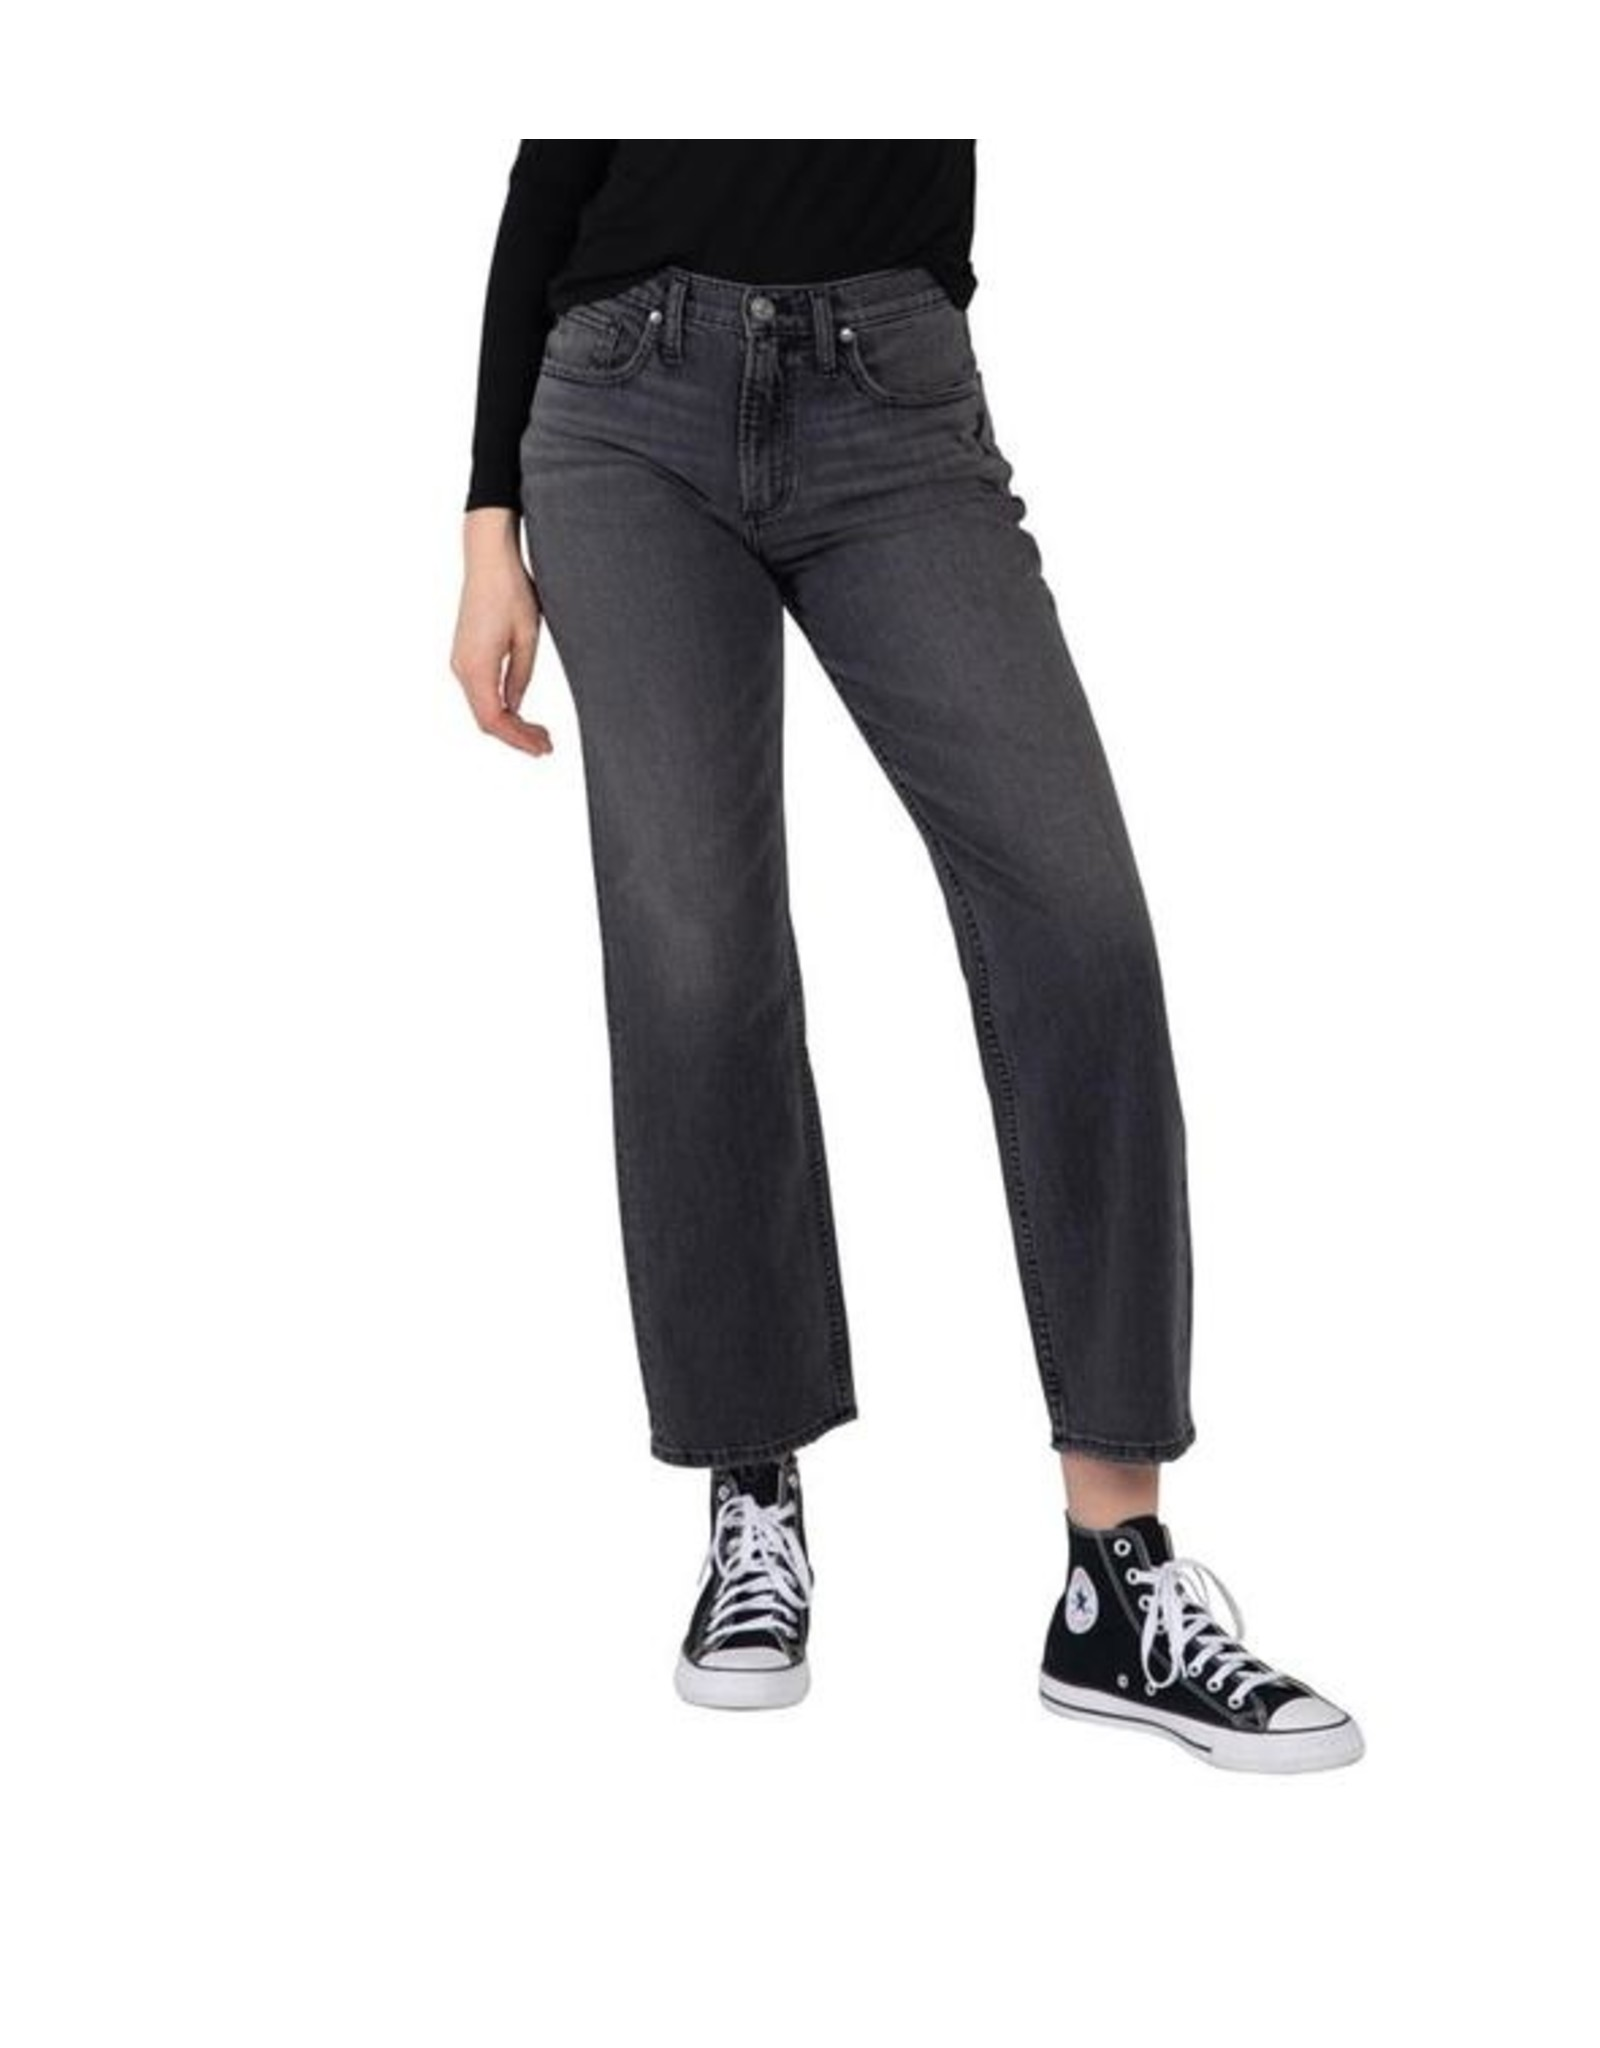 Silver Jeans - Frisco Straight Leg